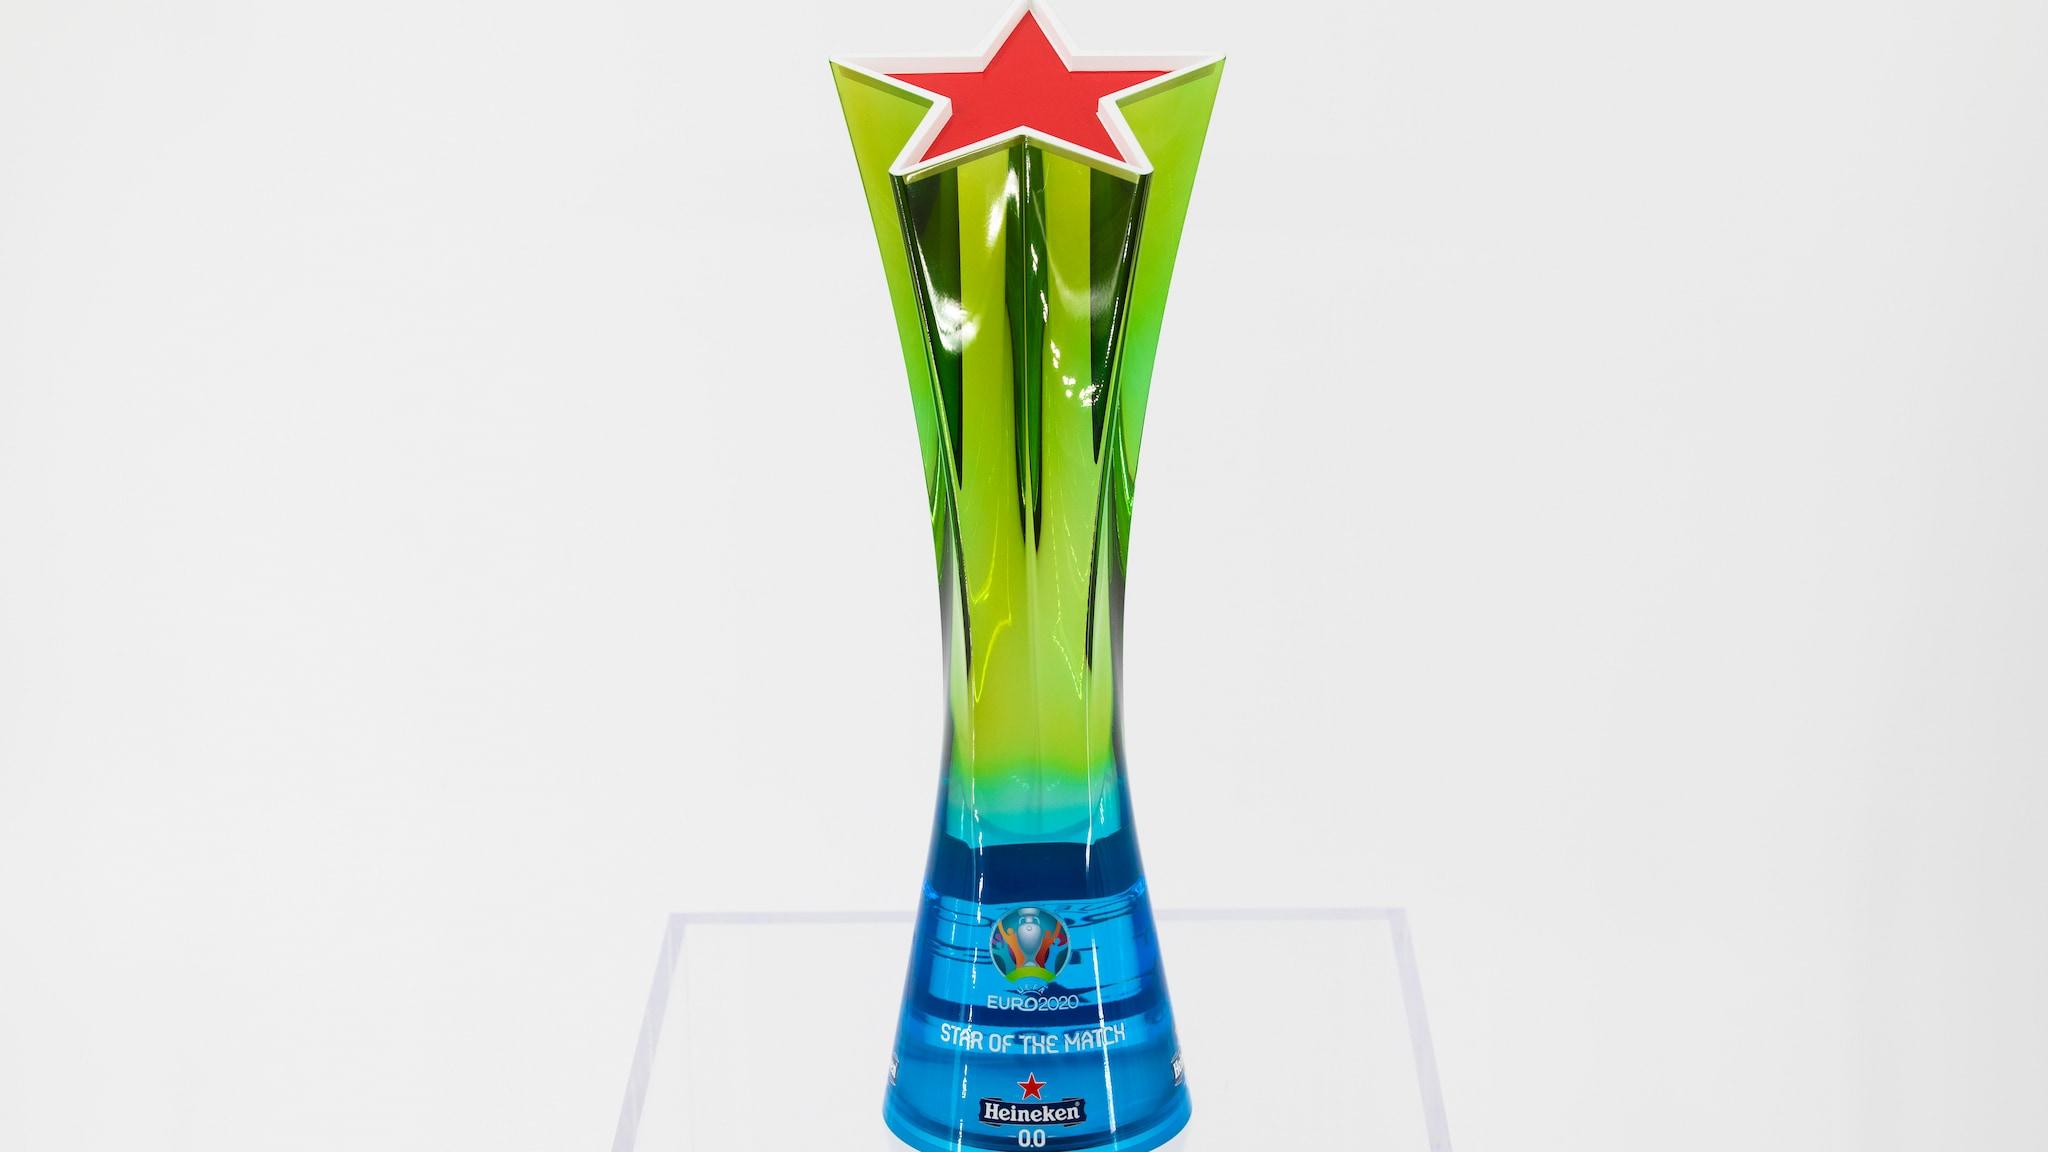 uefa euro 2020 - photo #42